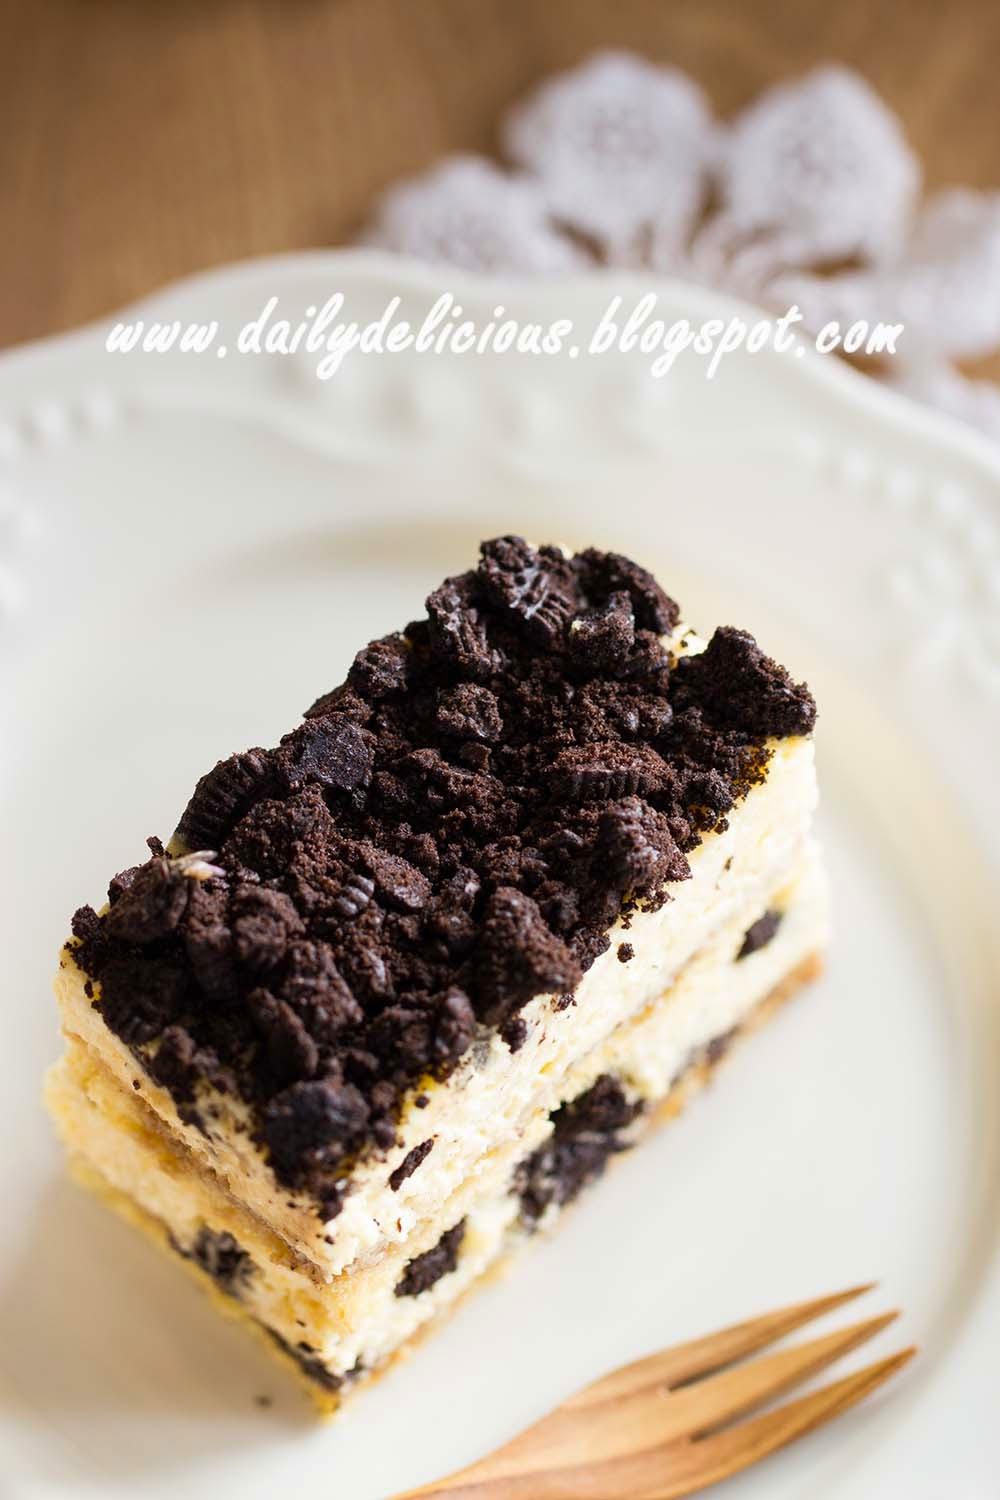 Kahlua Cream Cake Filling